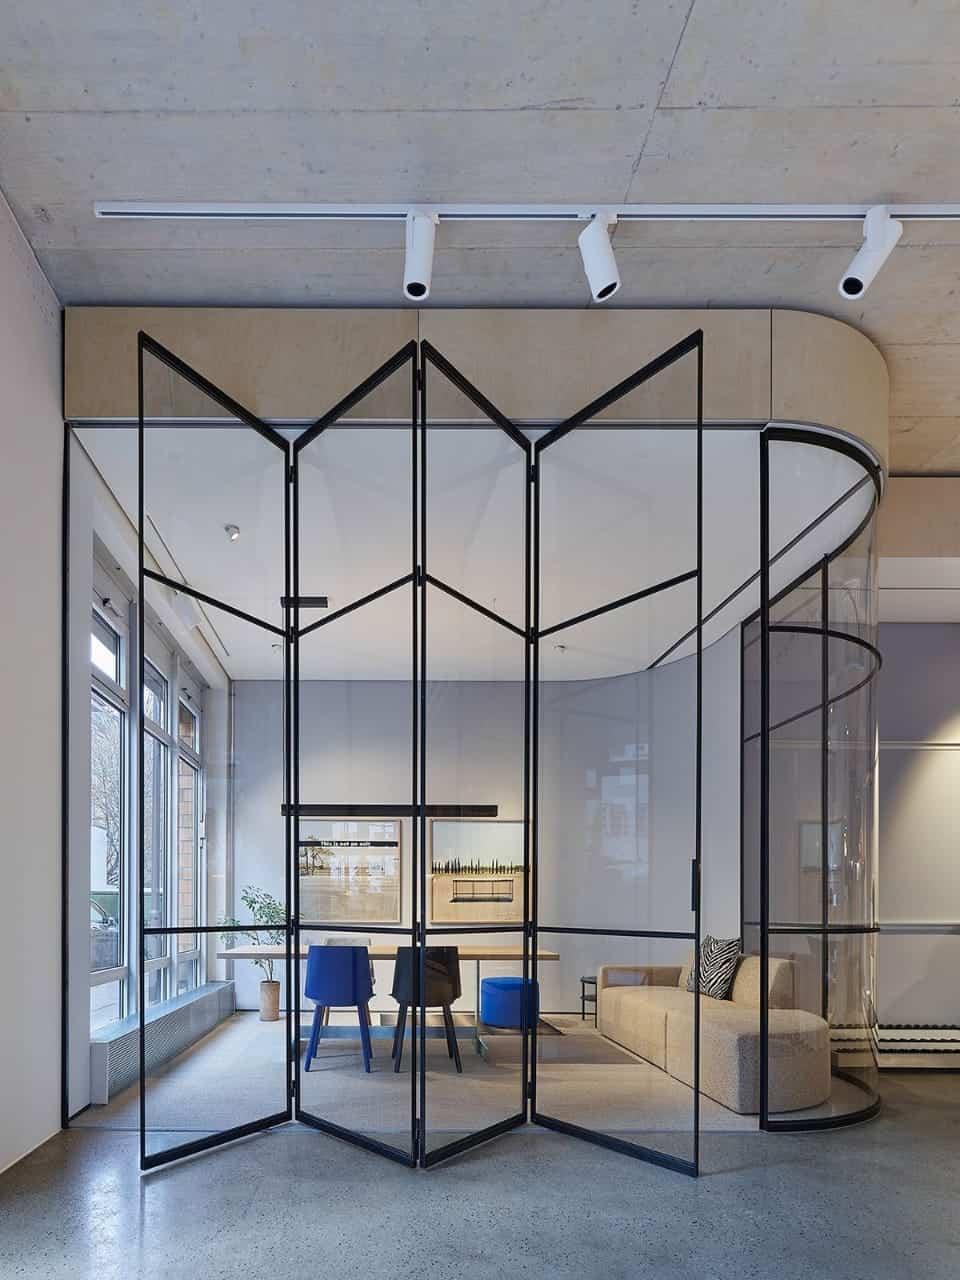 glass bi-fold living room door designs with black metal frame